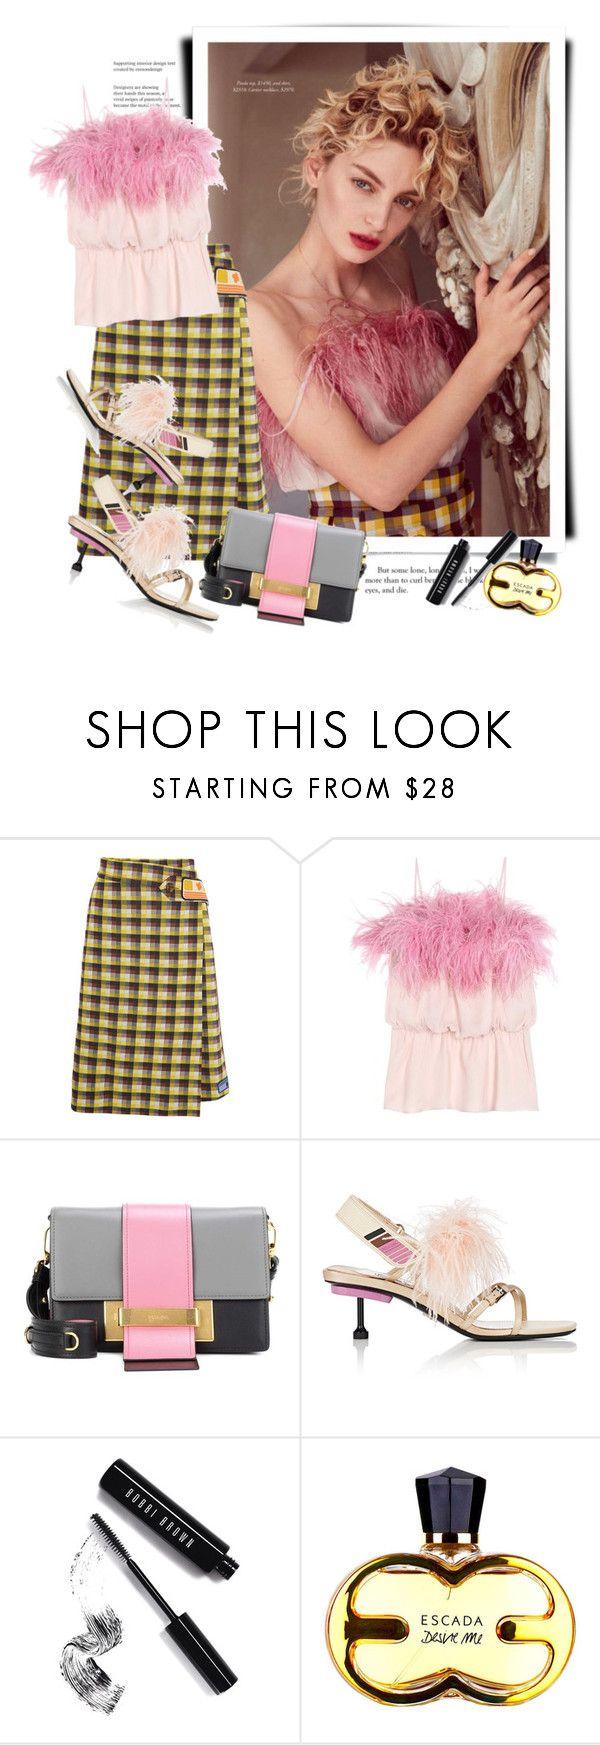 """Prada Spring 2017"" by sella103 ❤ liked on Polyvore featuring Prada and Bobbi Brown Cosmetics"